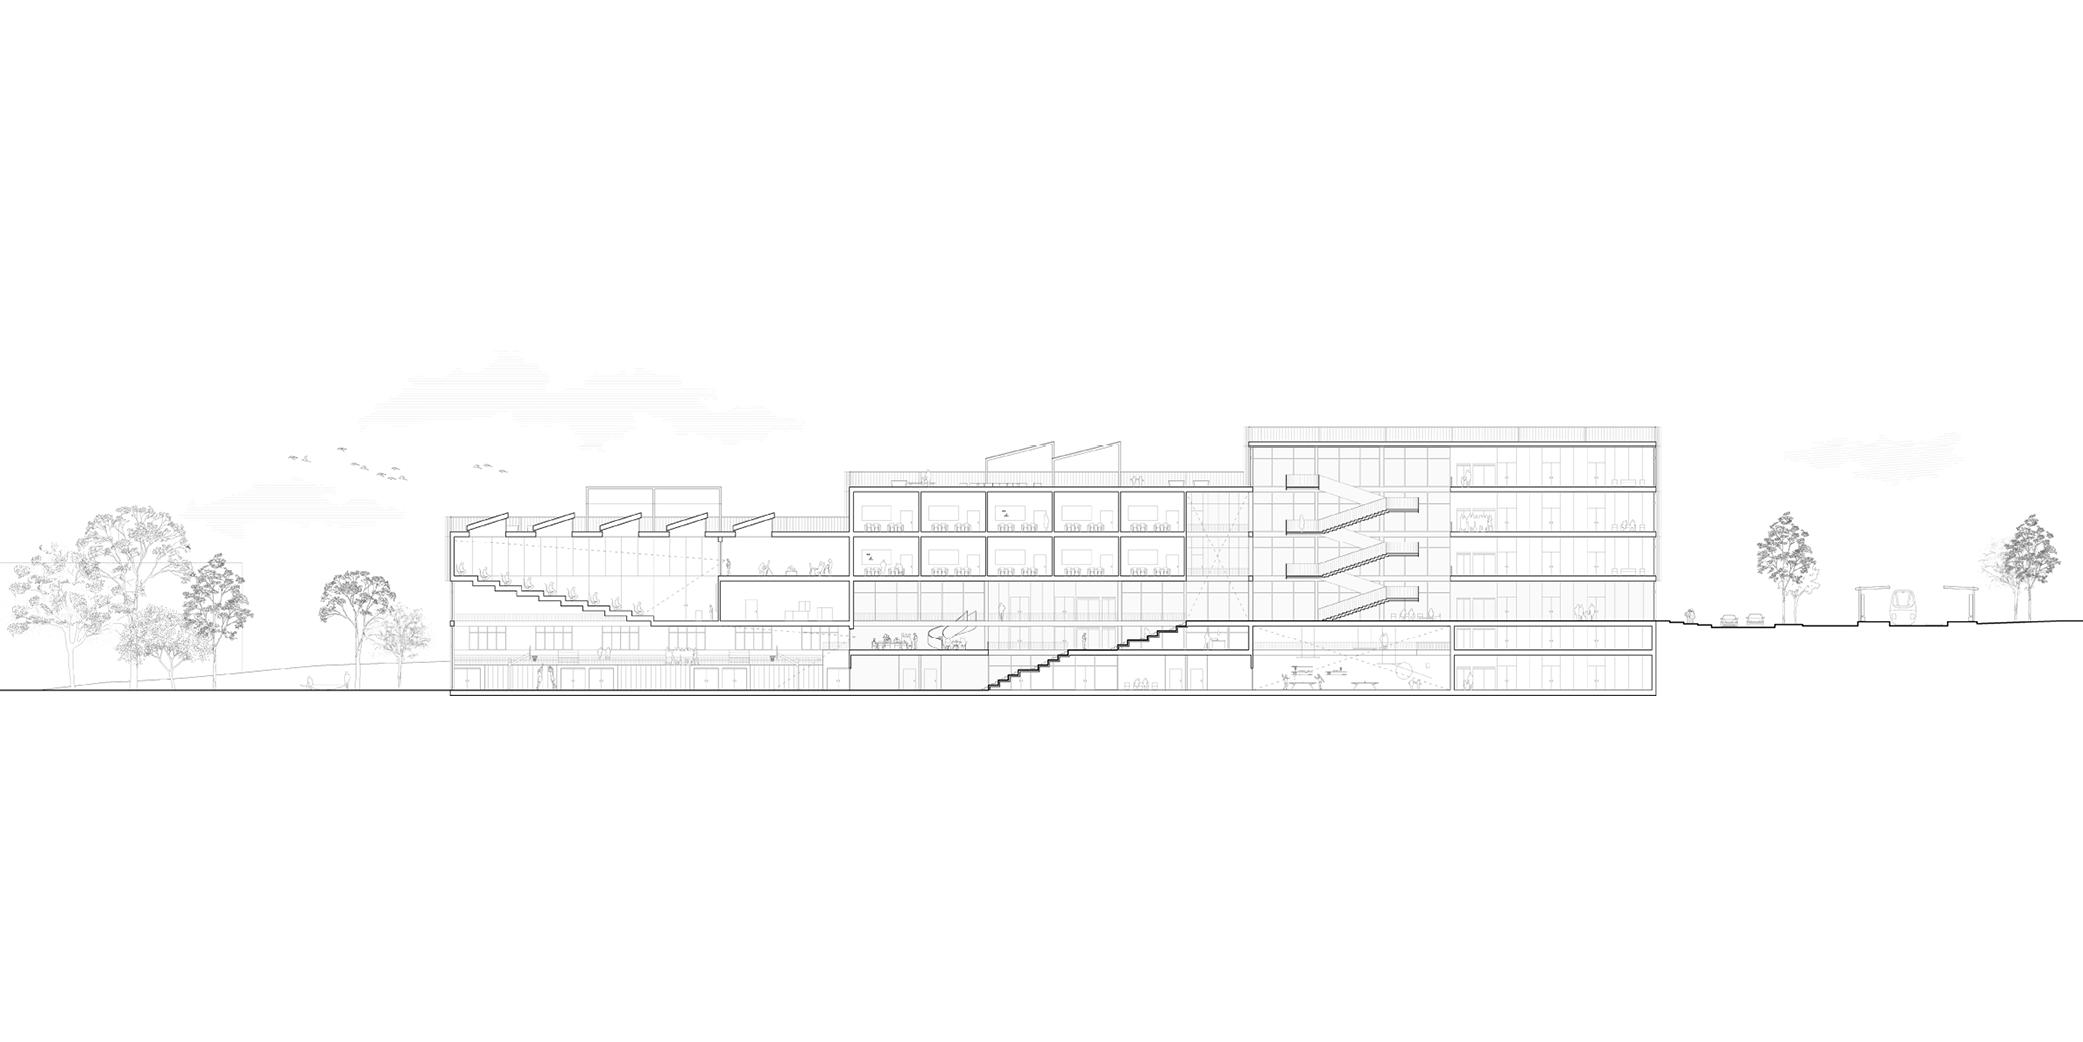 OCA architects New Elementary School and Kindergarten for - Nová ZS a MS pro - Dolní Měcholupy Hernan Lleida Ruiz Bernardo Garcia Morales22